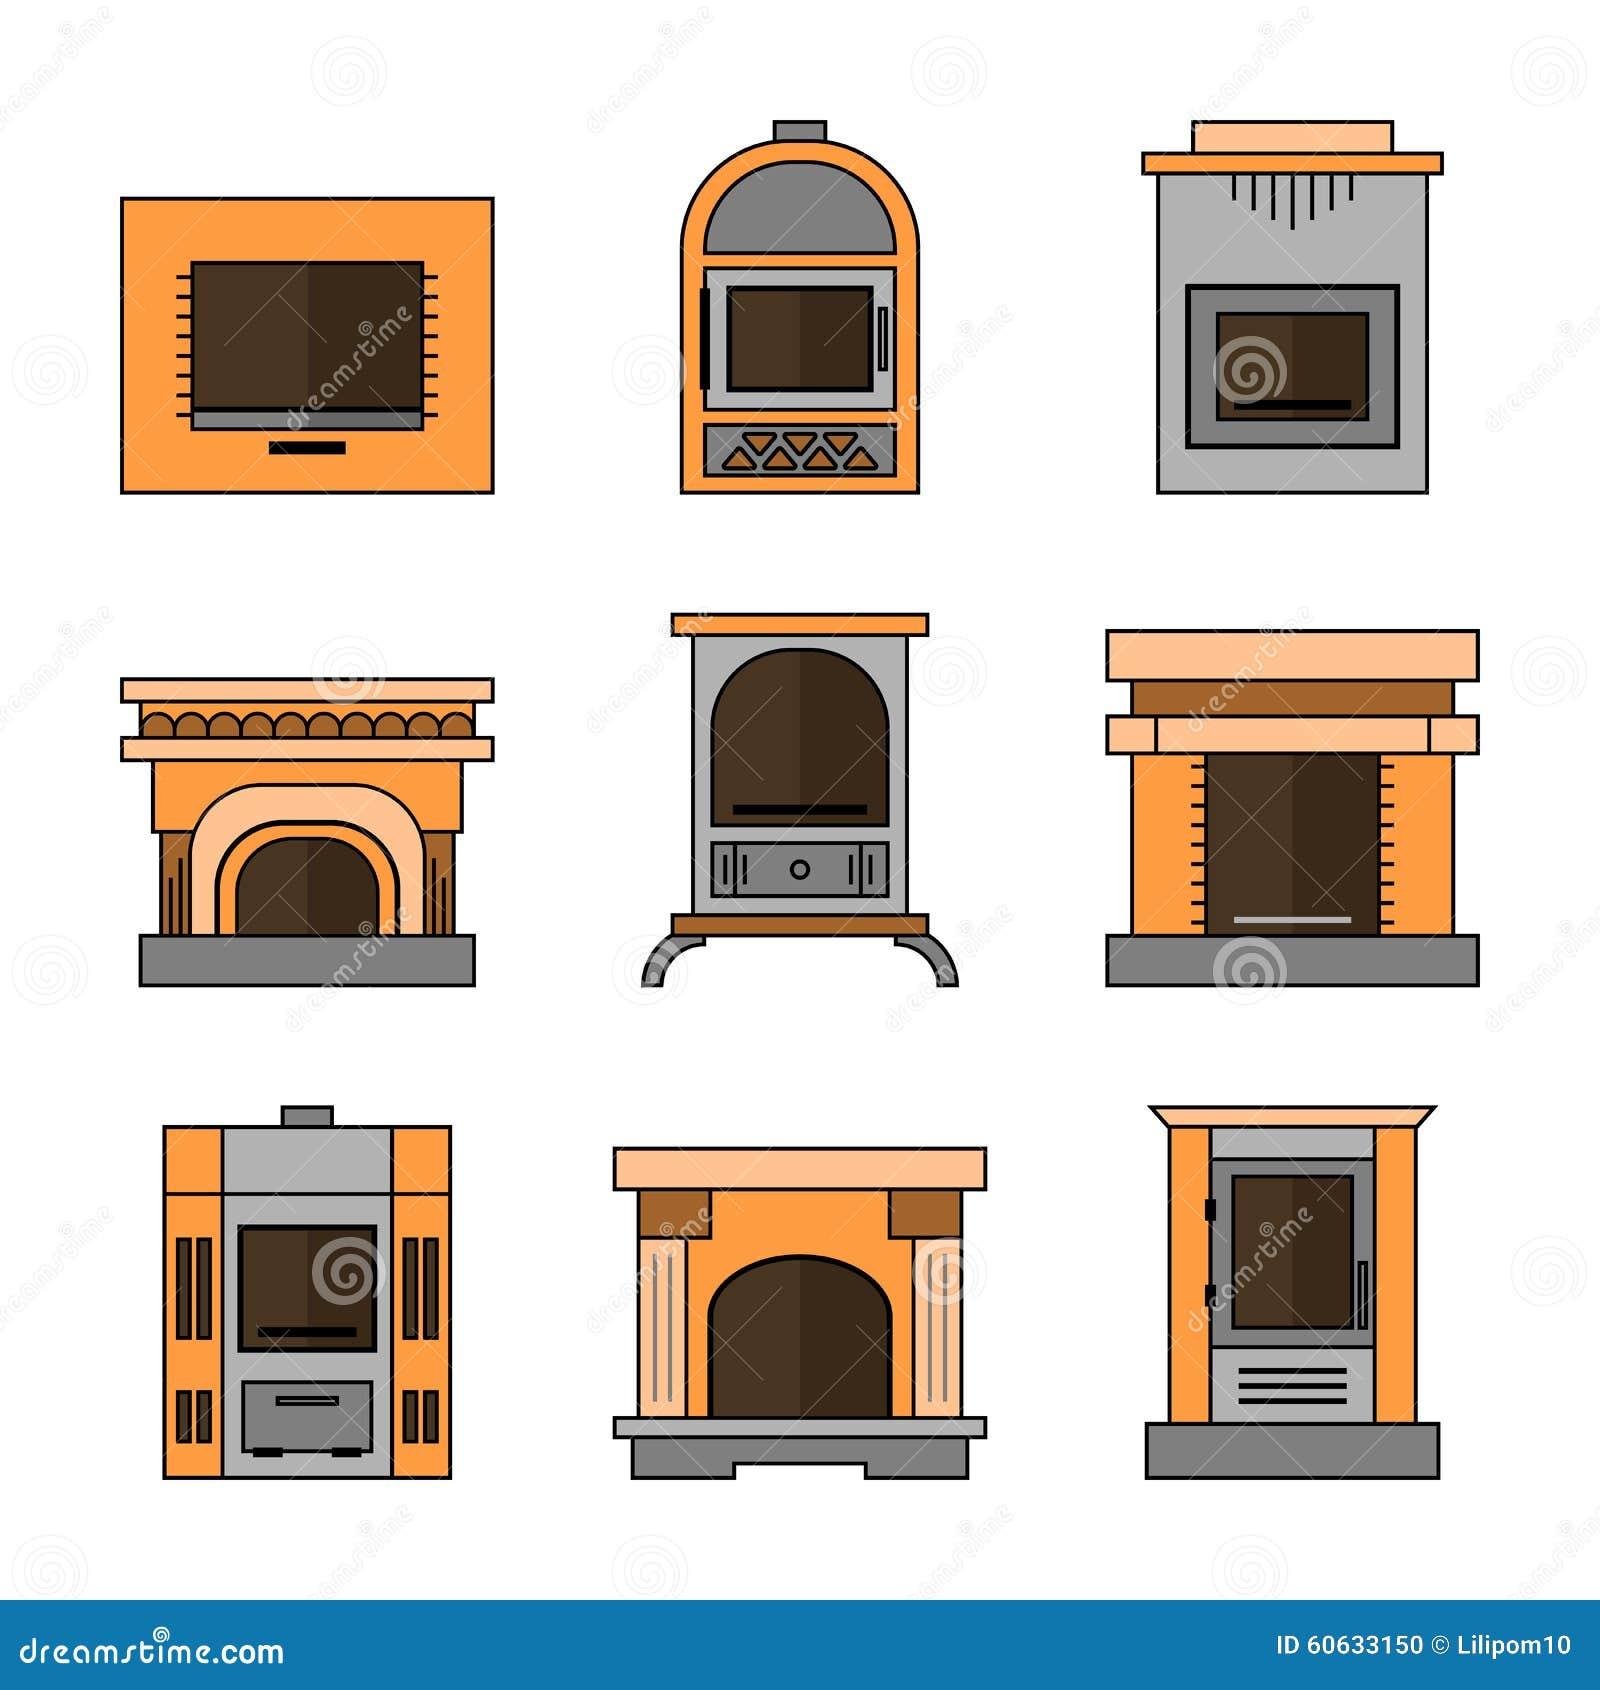 Chimeneas iconos planos ilustraci n del vector imagen - Chimeneas de diseno ...